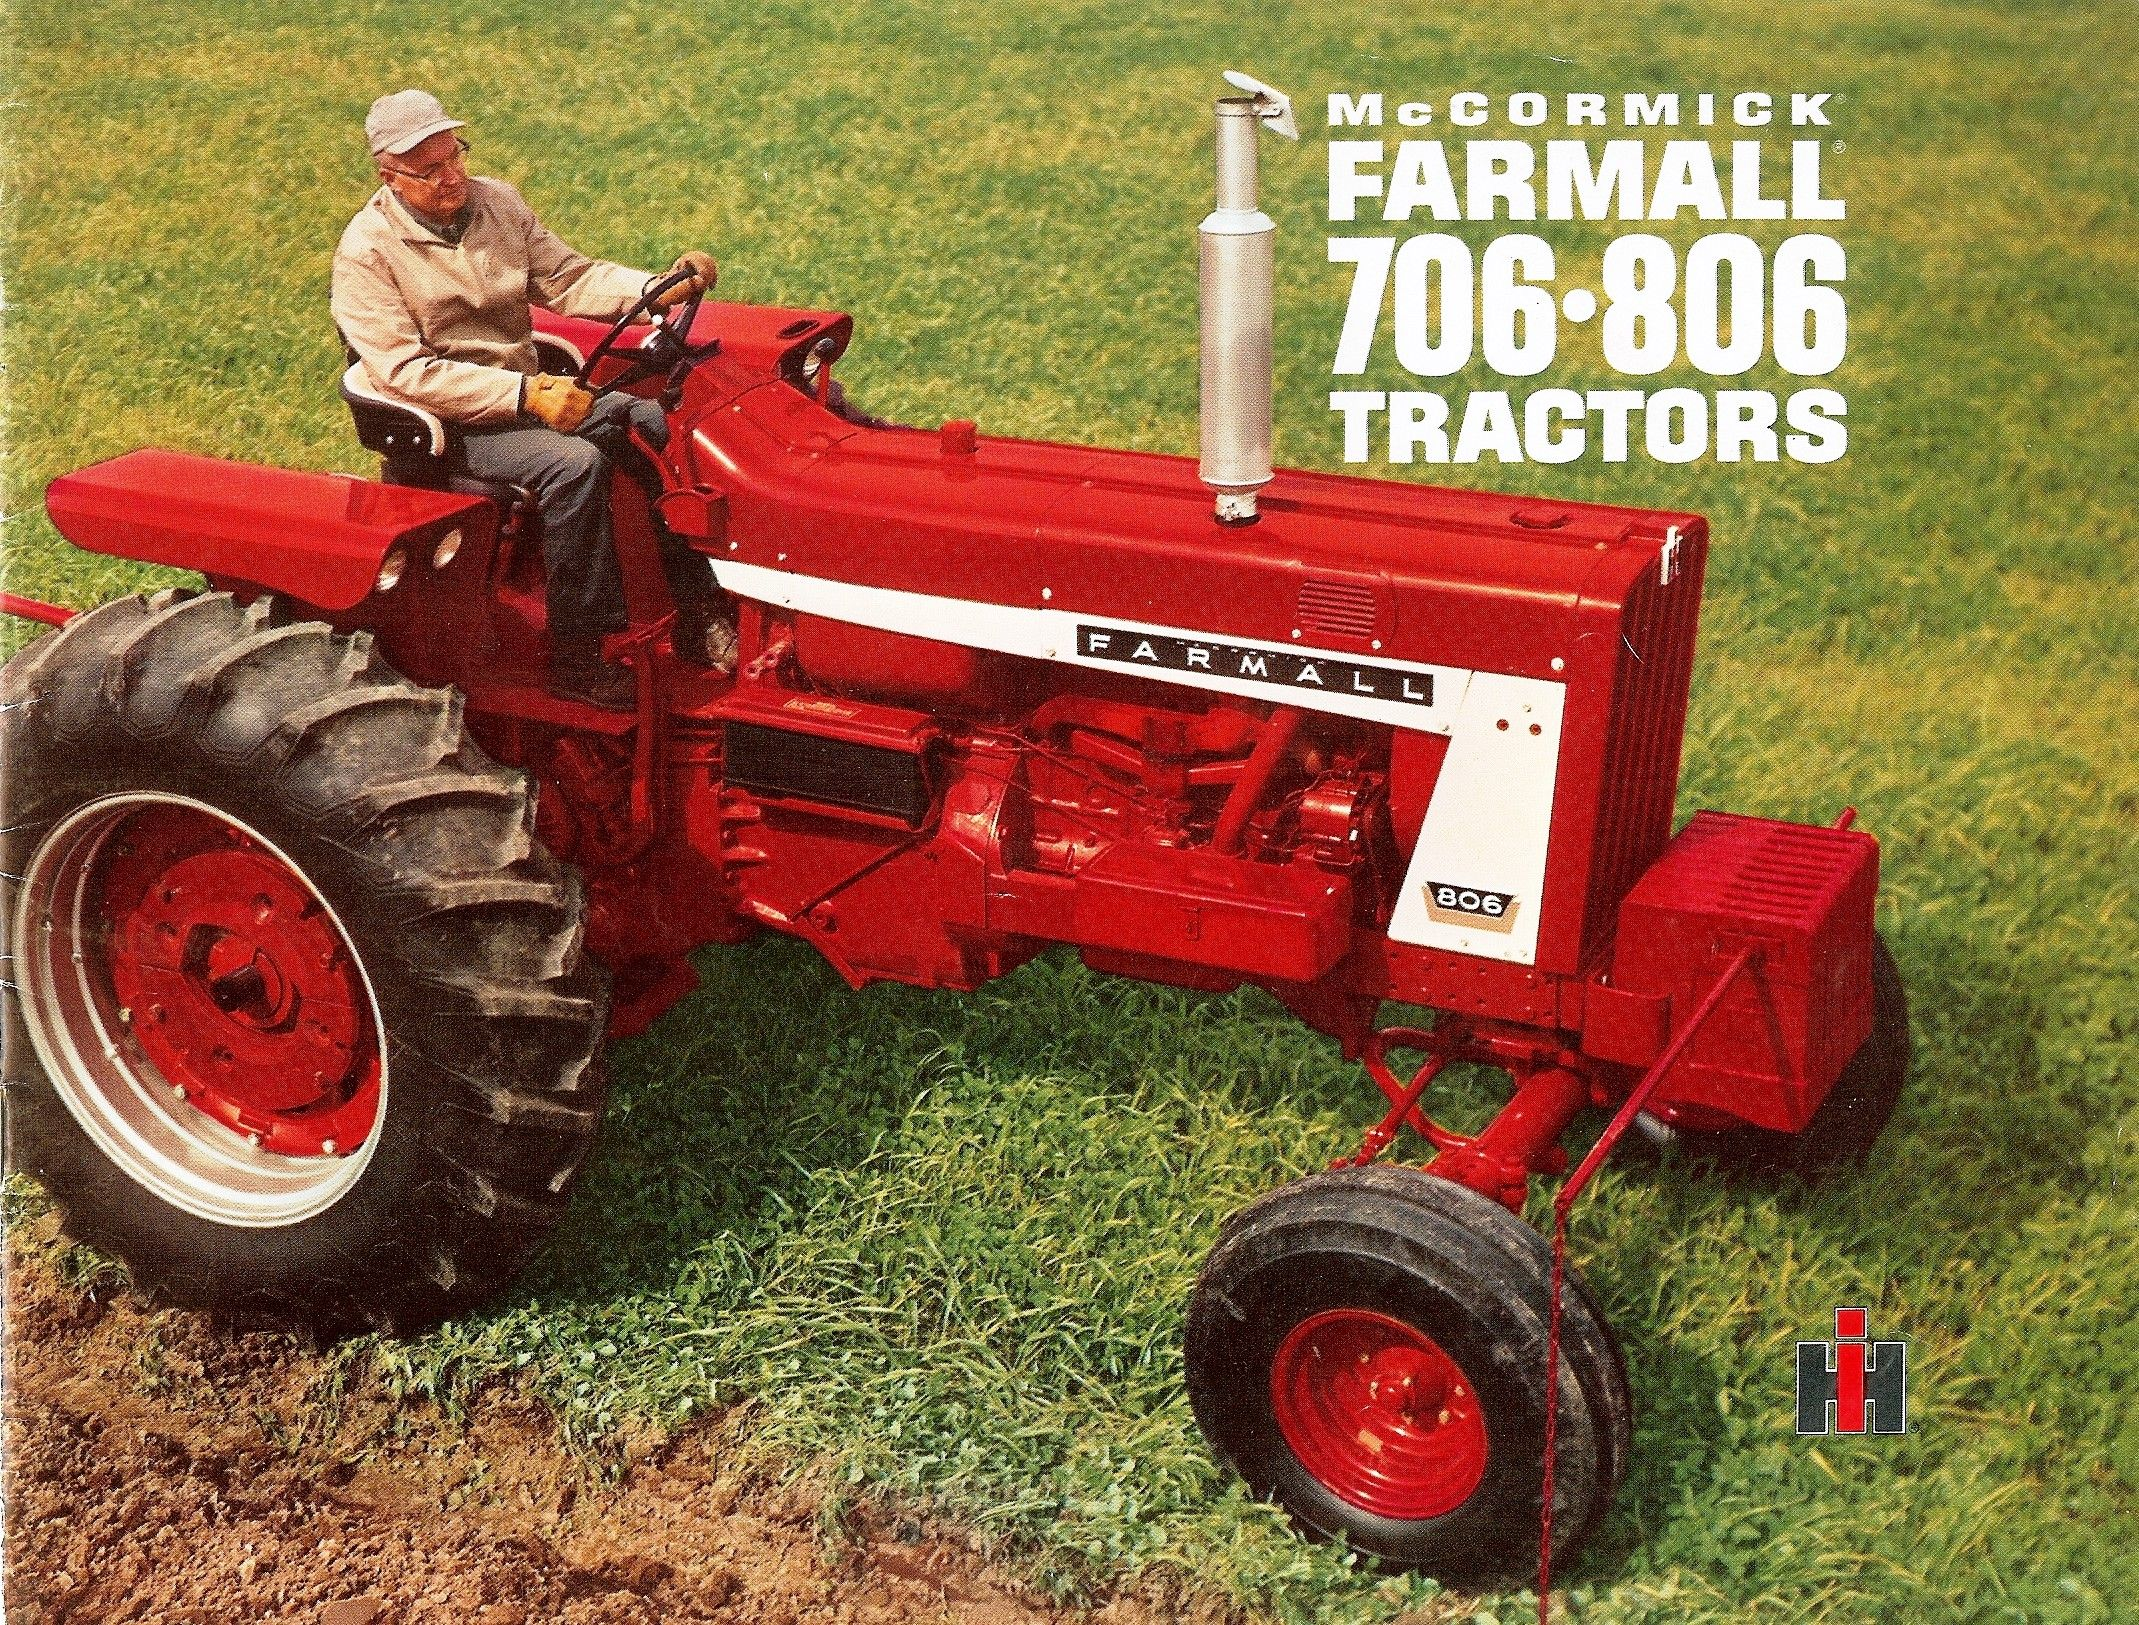 small resolution of farmall 706 806 tractors international harvester advertising set also 806 farmall tractor wiring harness in addition 560 farmall